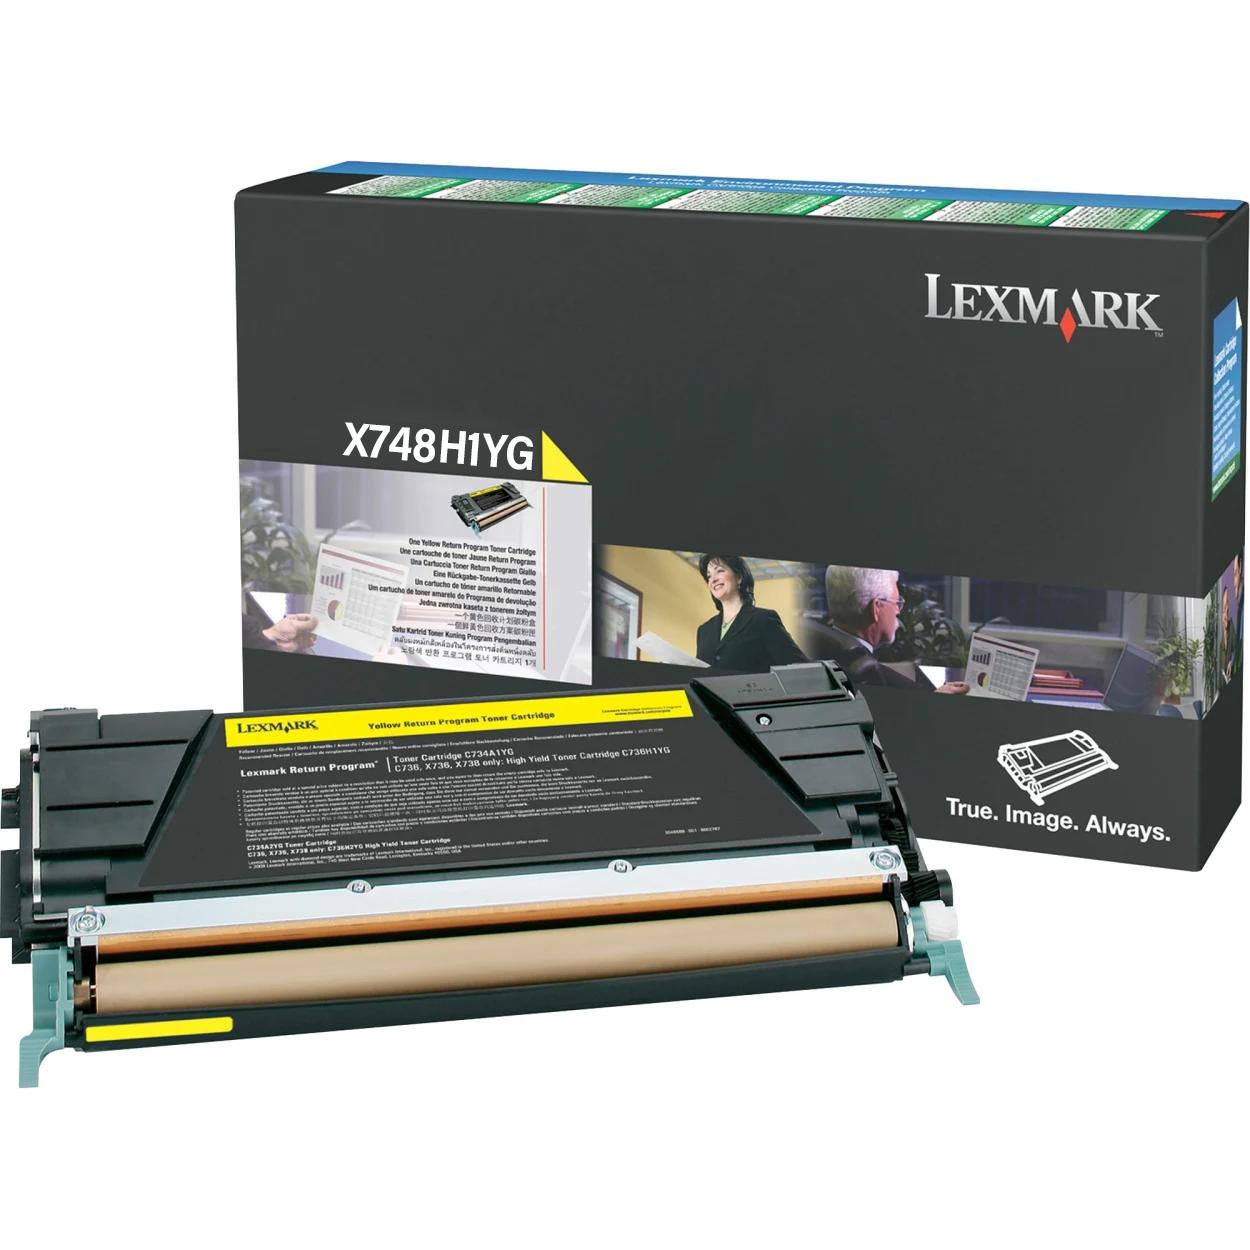 Original Lexmark X748H1YG X748 Yellow Return Program High-Yield Toner Cartridge